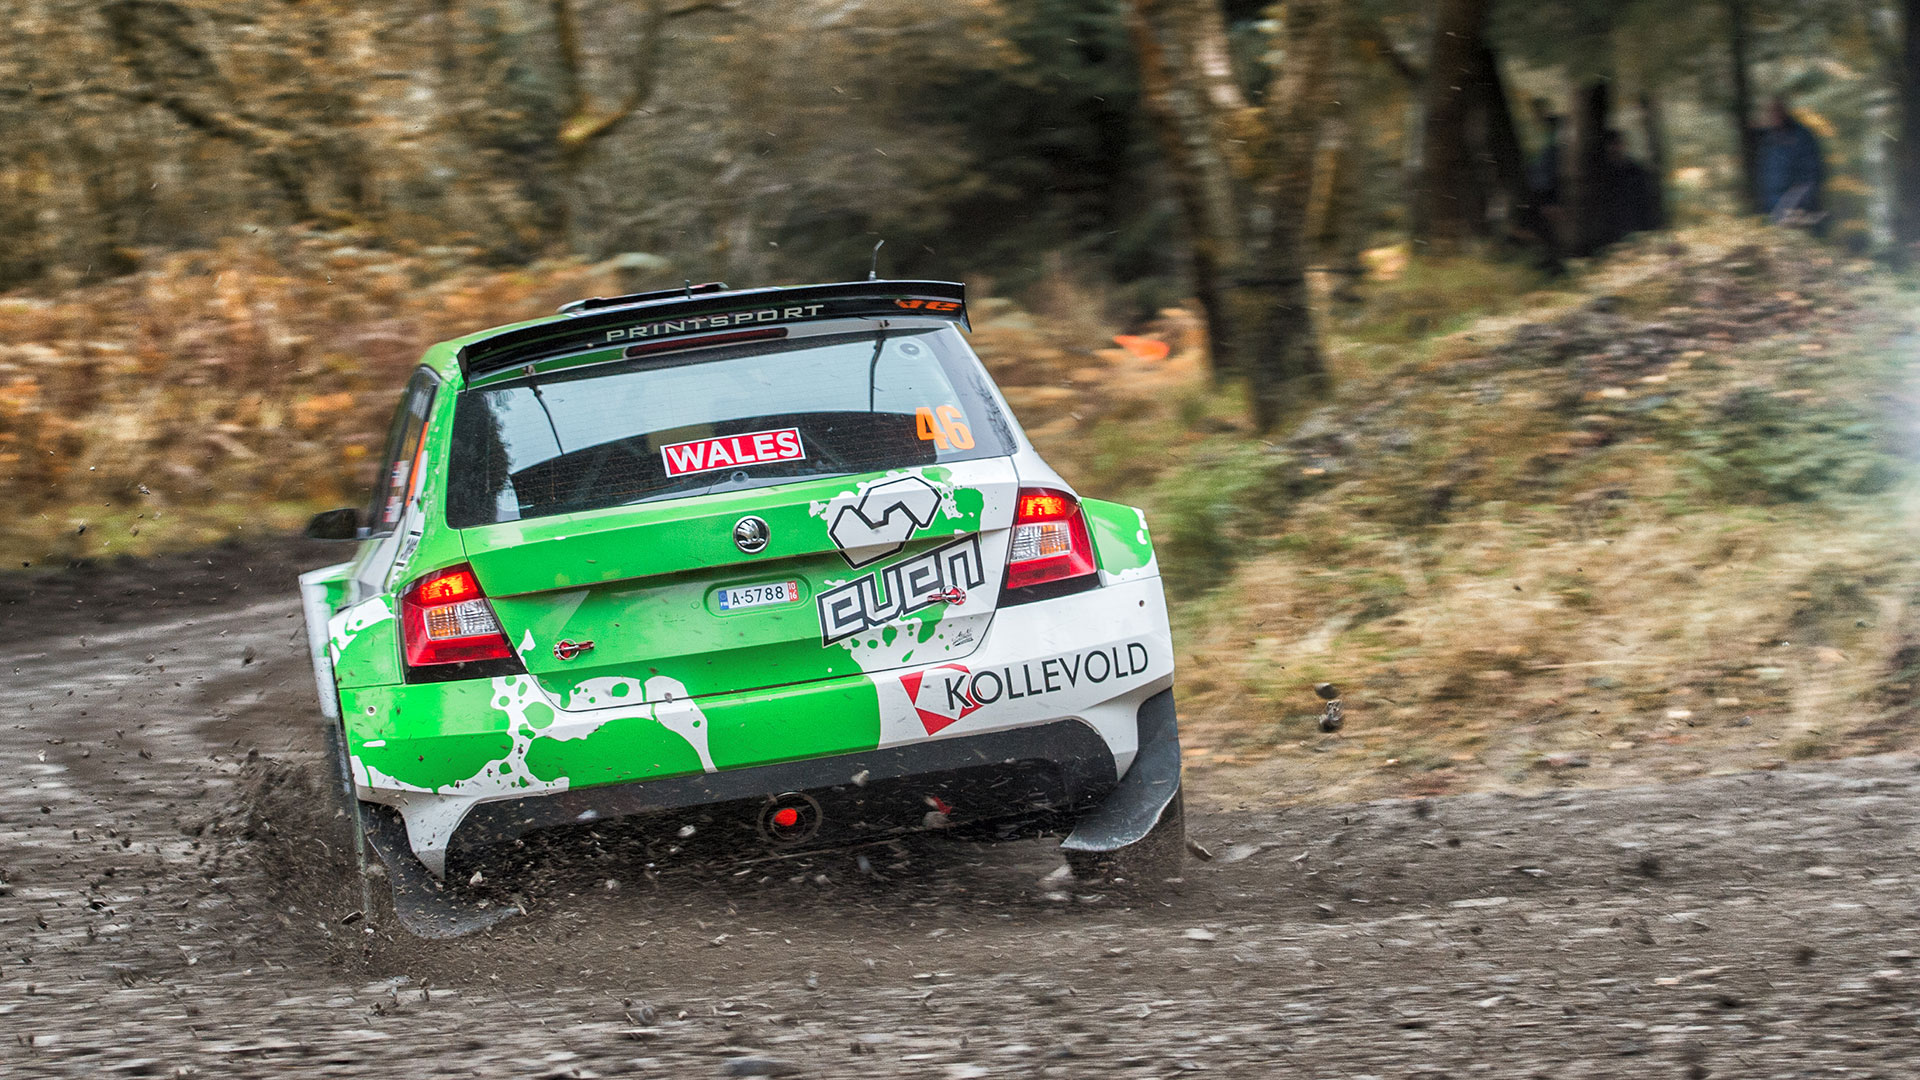 Ole Christian Veiby / Stig Rune Skjærmoen, ŠKODA FABIA R5, Printsport Oy. Dayinsure Wales Rally GB 2016